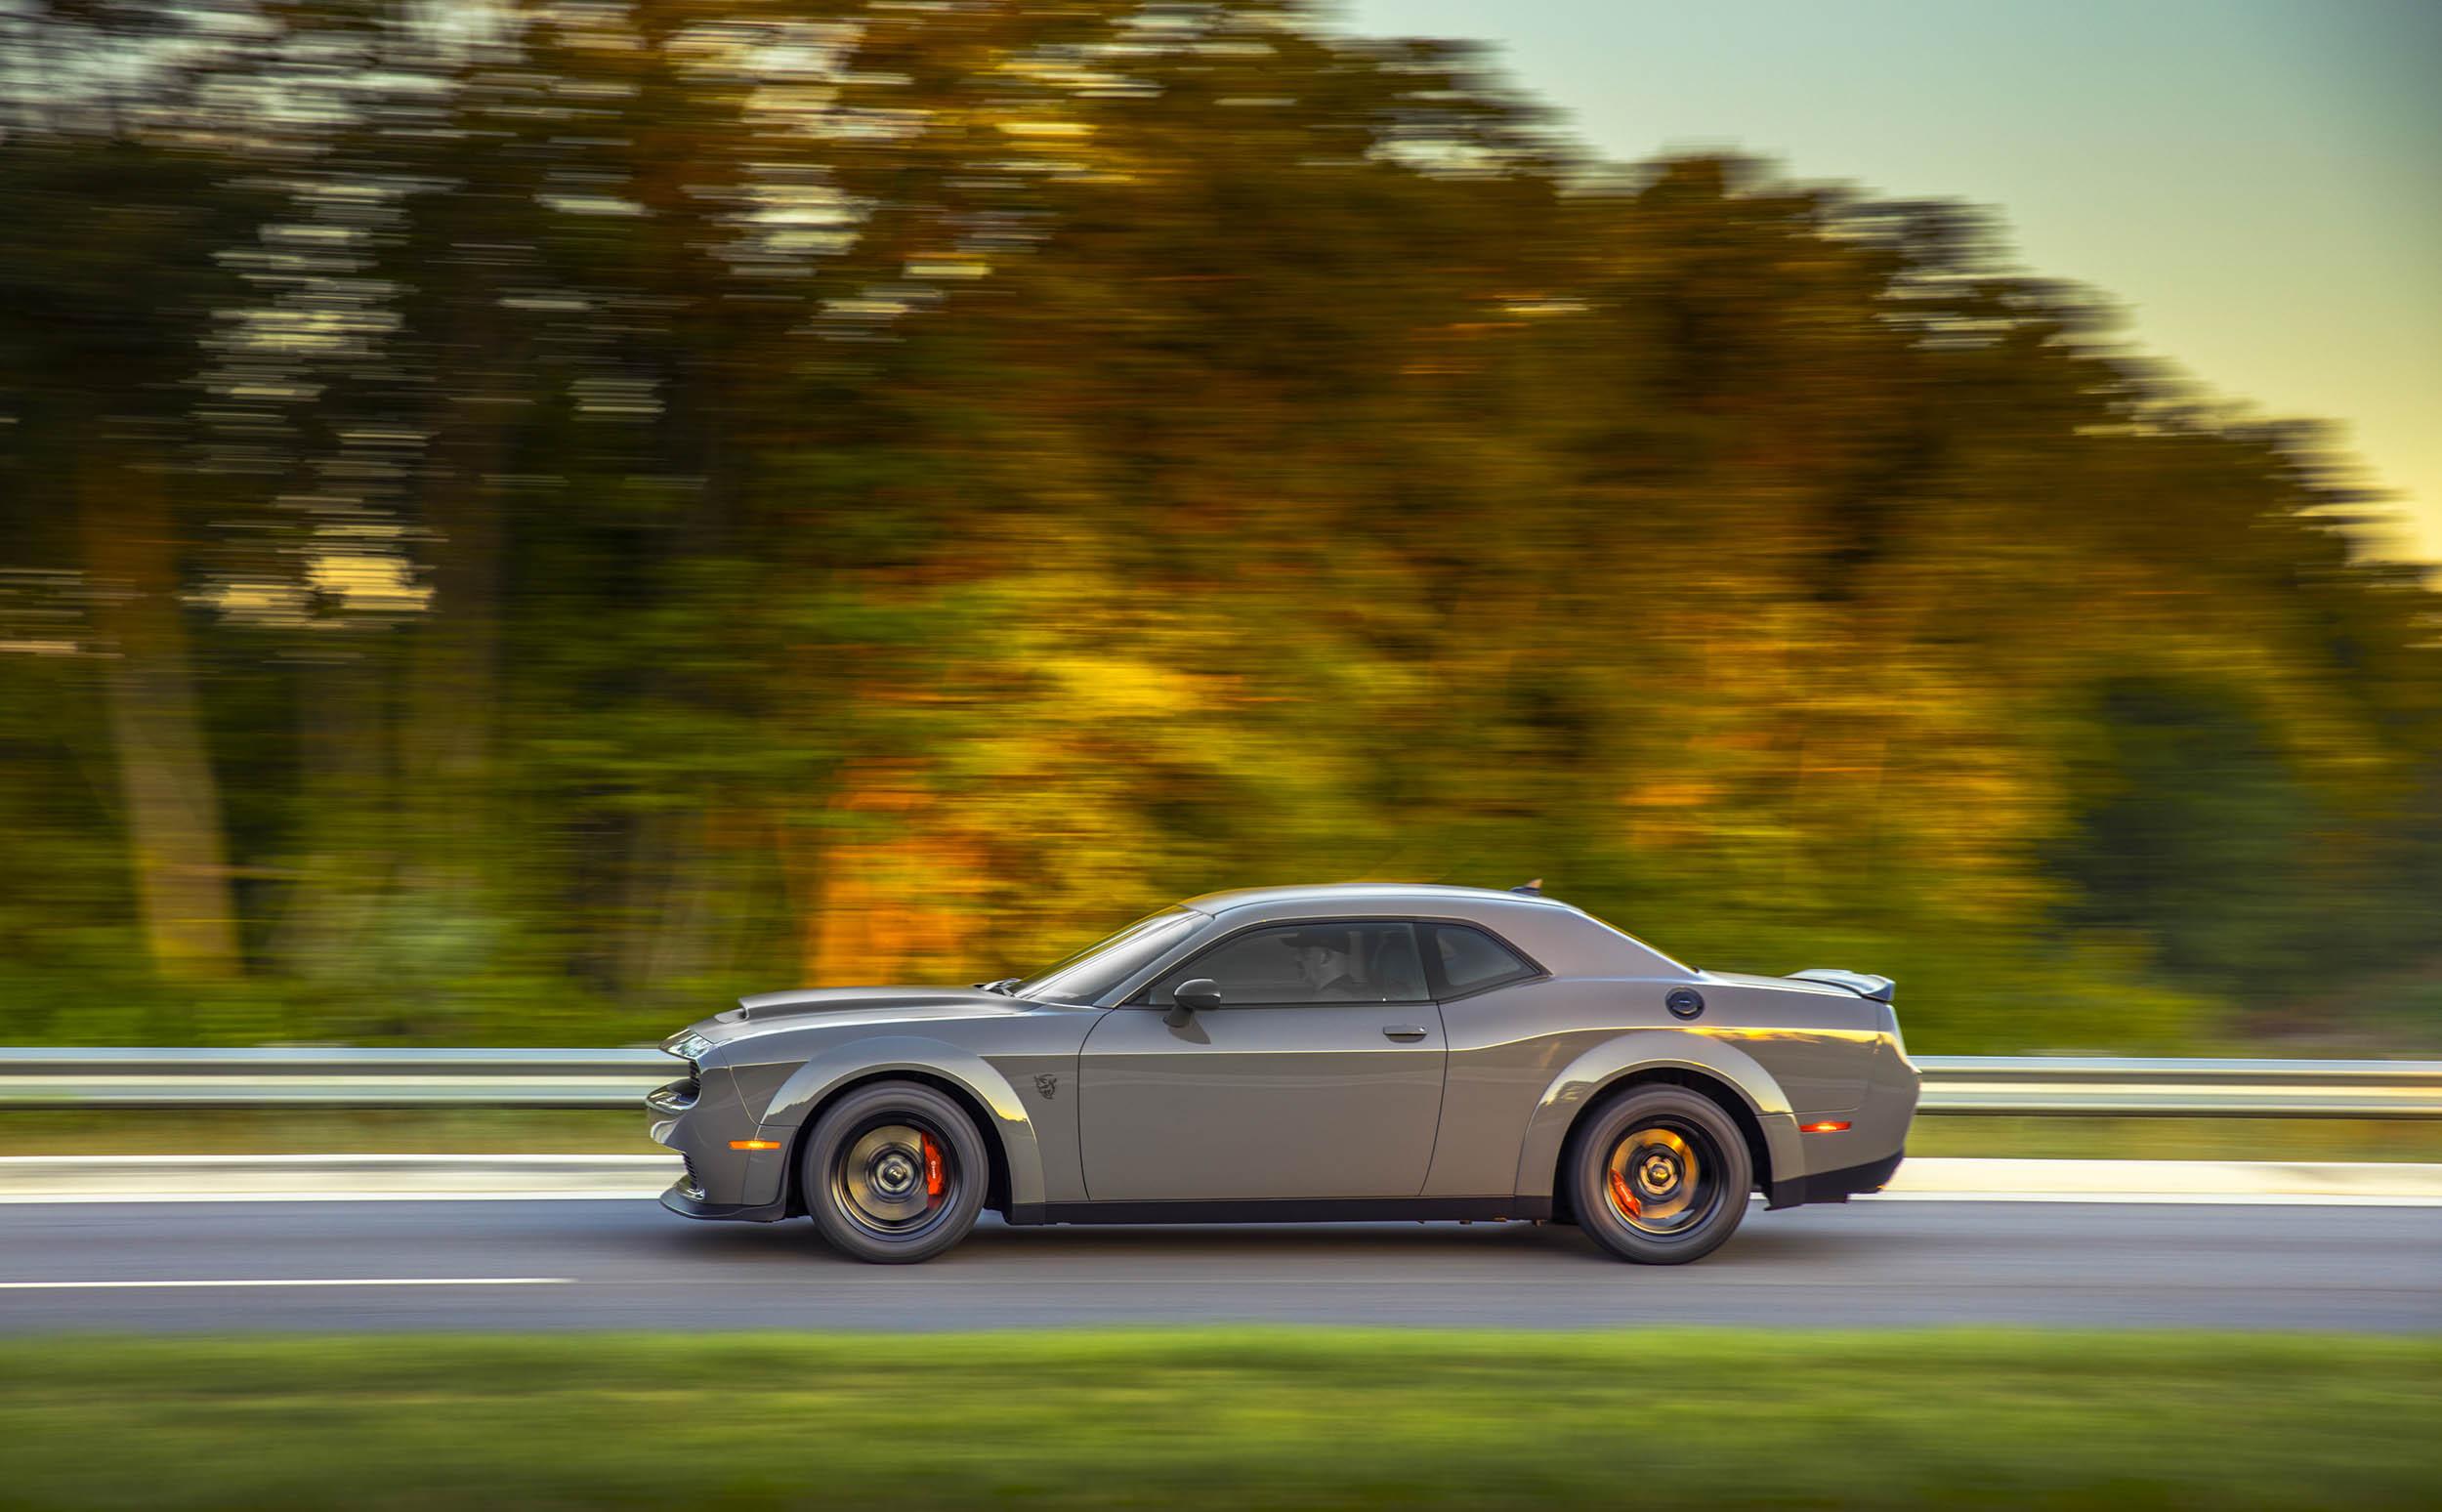 2018 Dodge Challenger SRT Demon profile